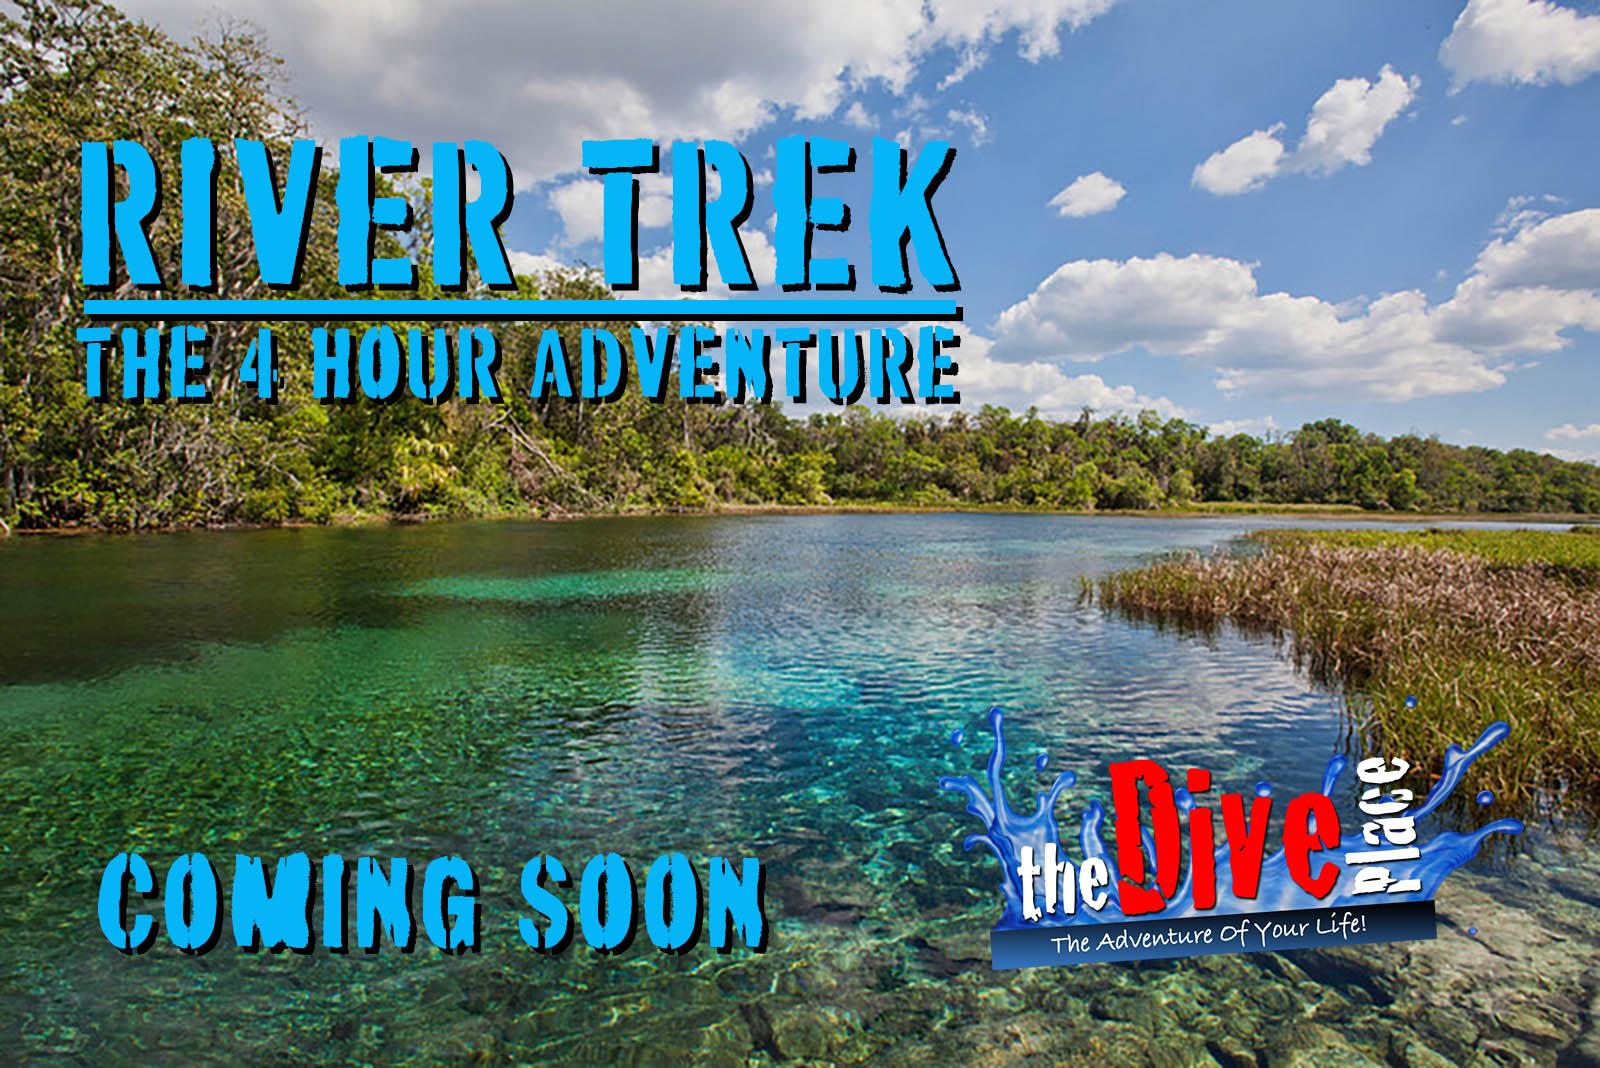 River Trek Teaser 1 TDP